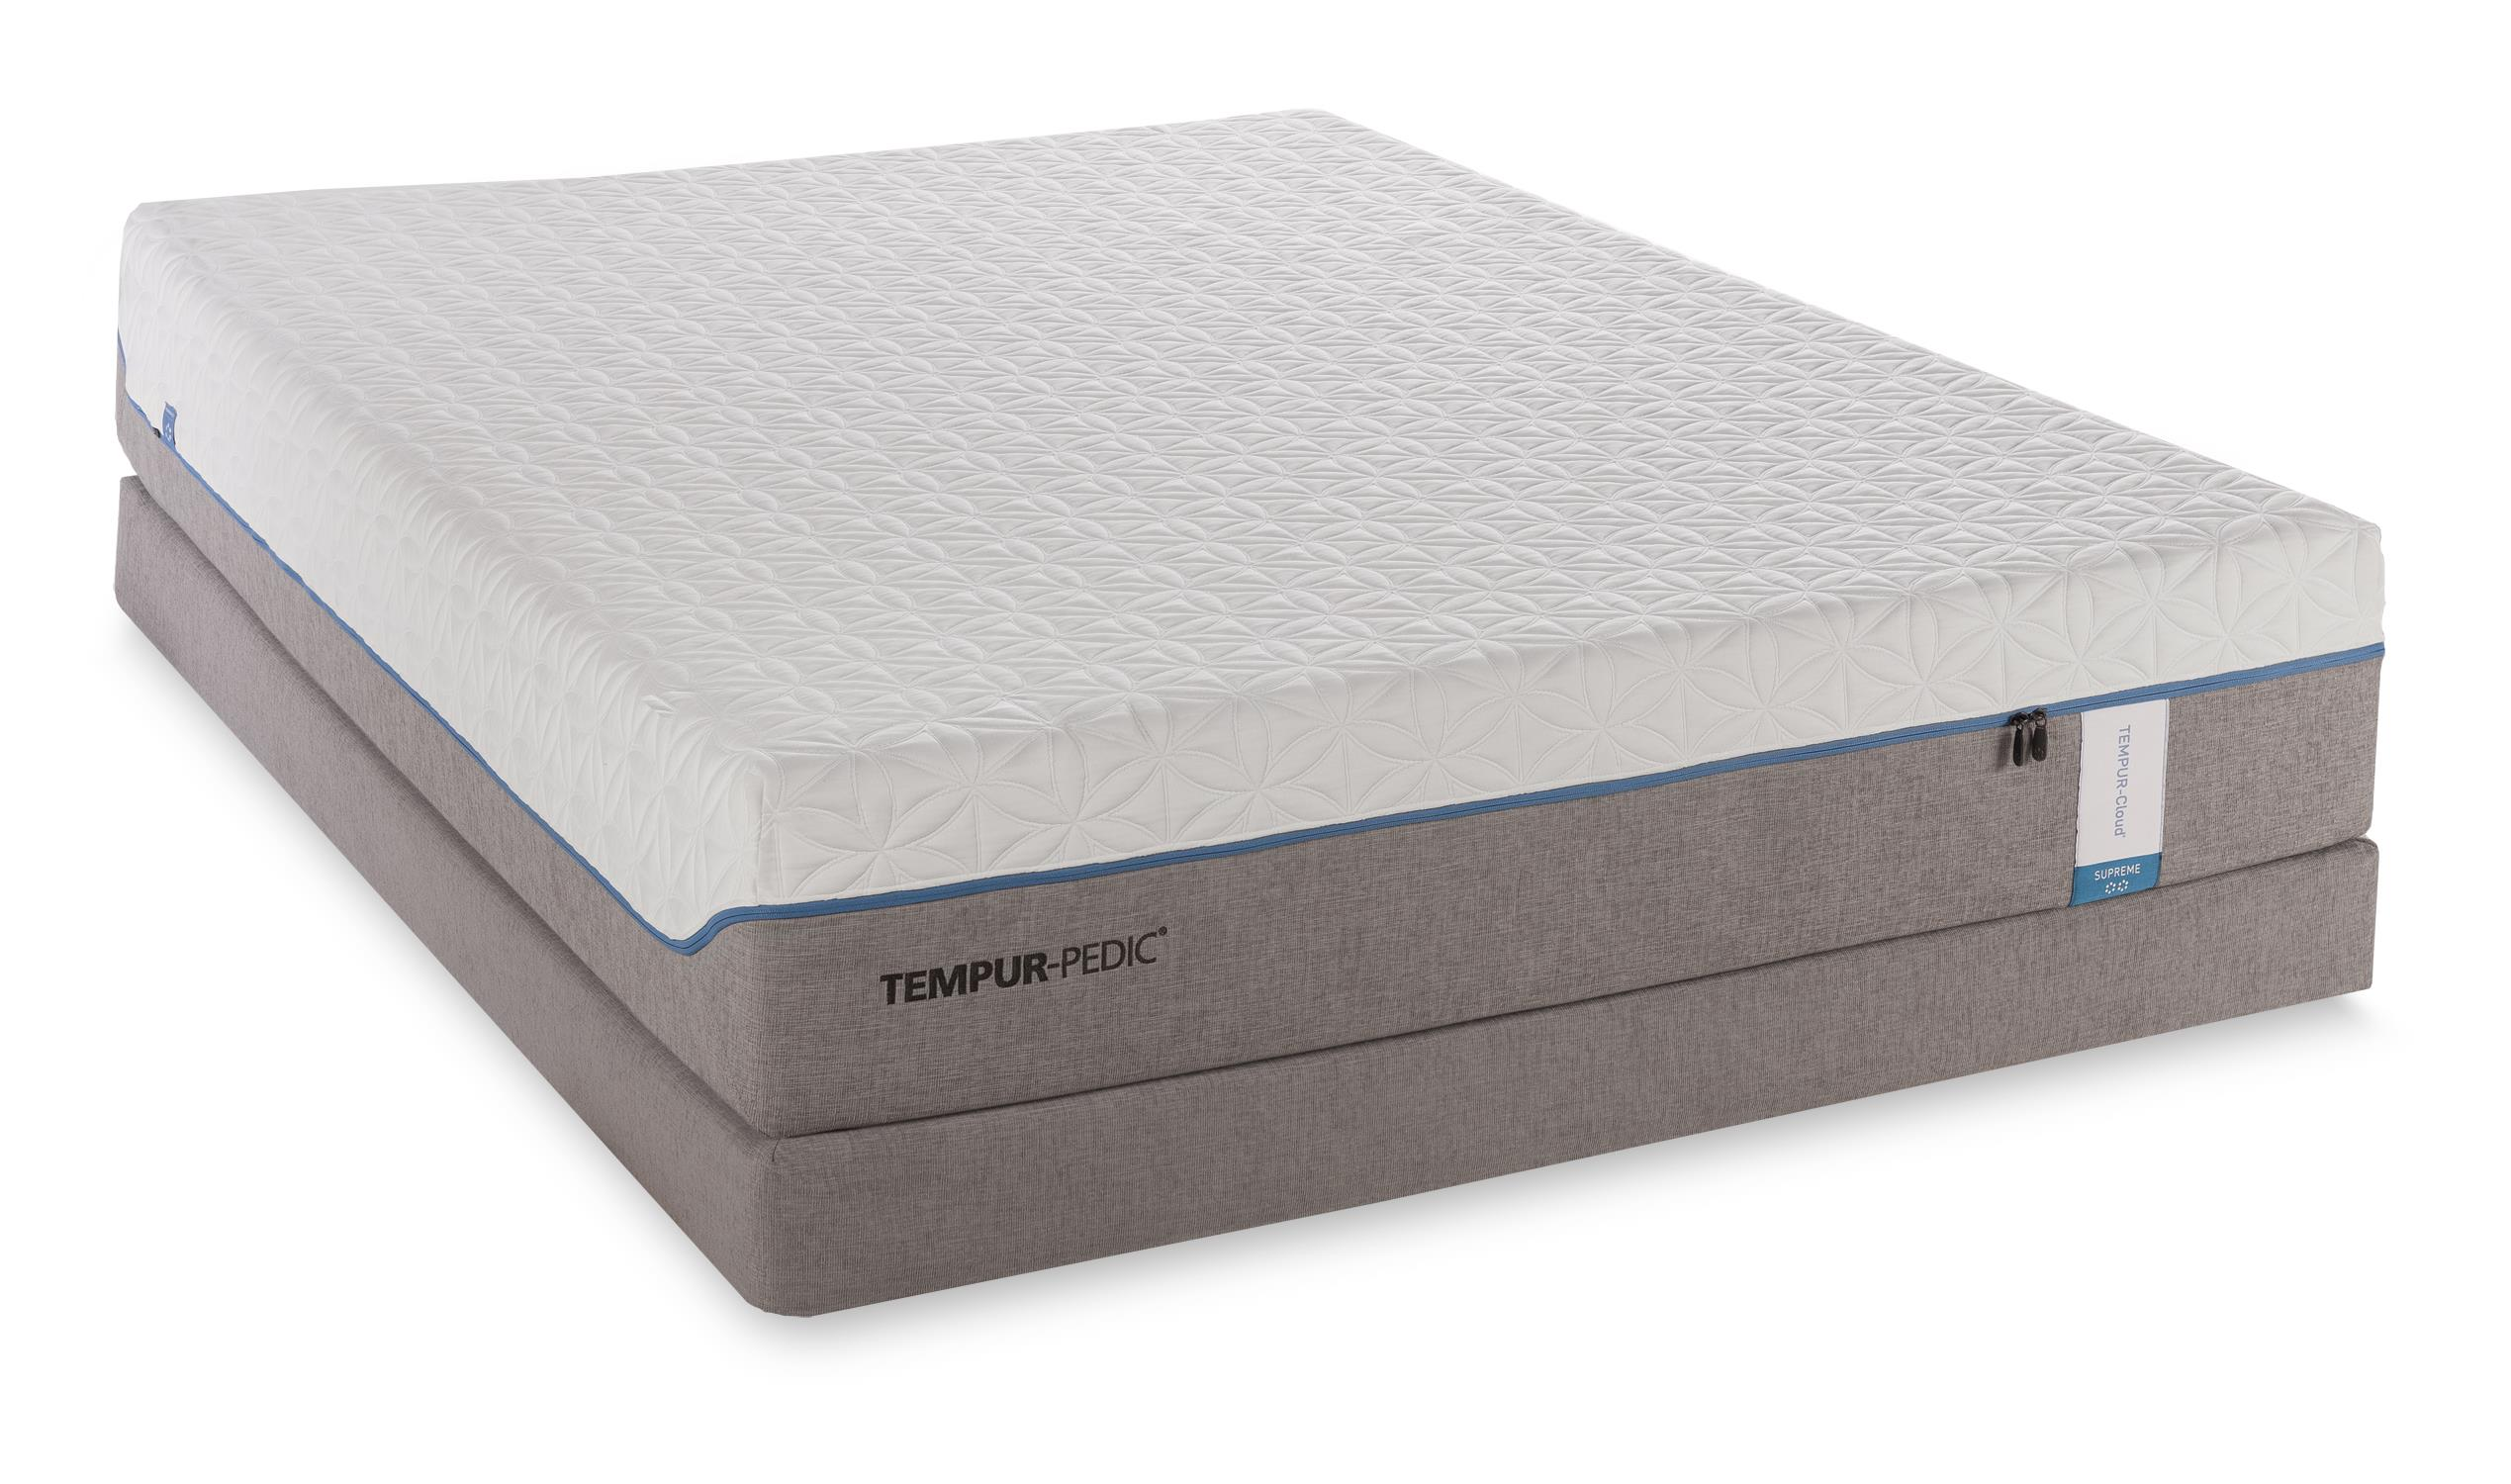 Tempur Pedic TEMPUR Cloud Supreme Full Soft Mattress and